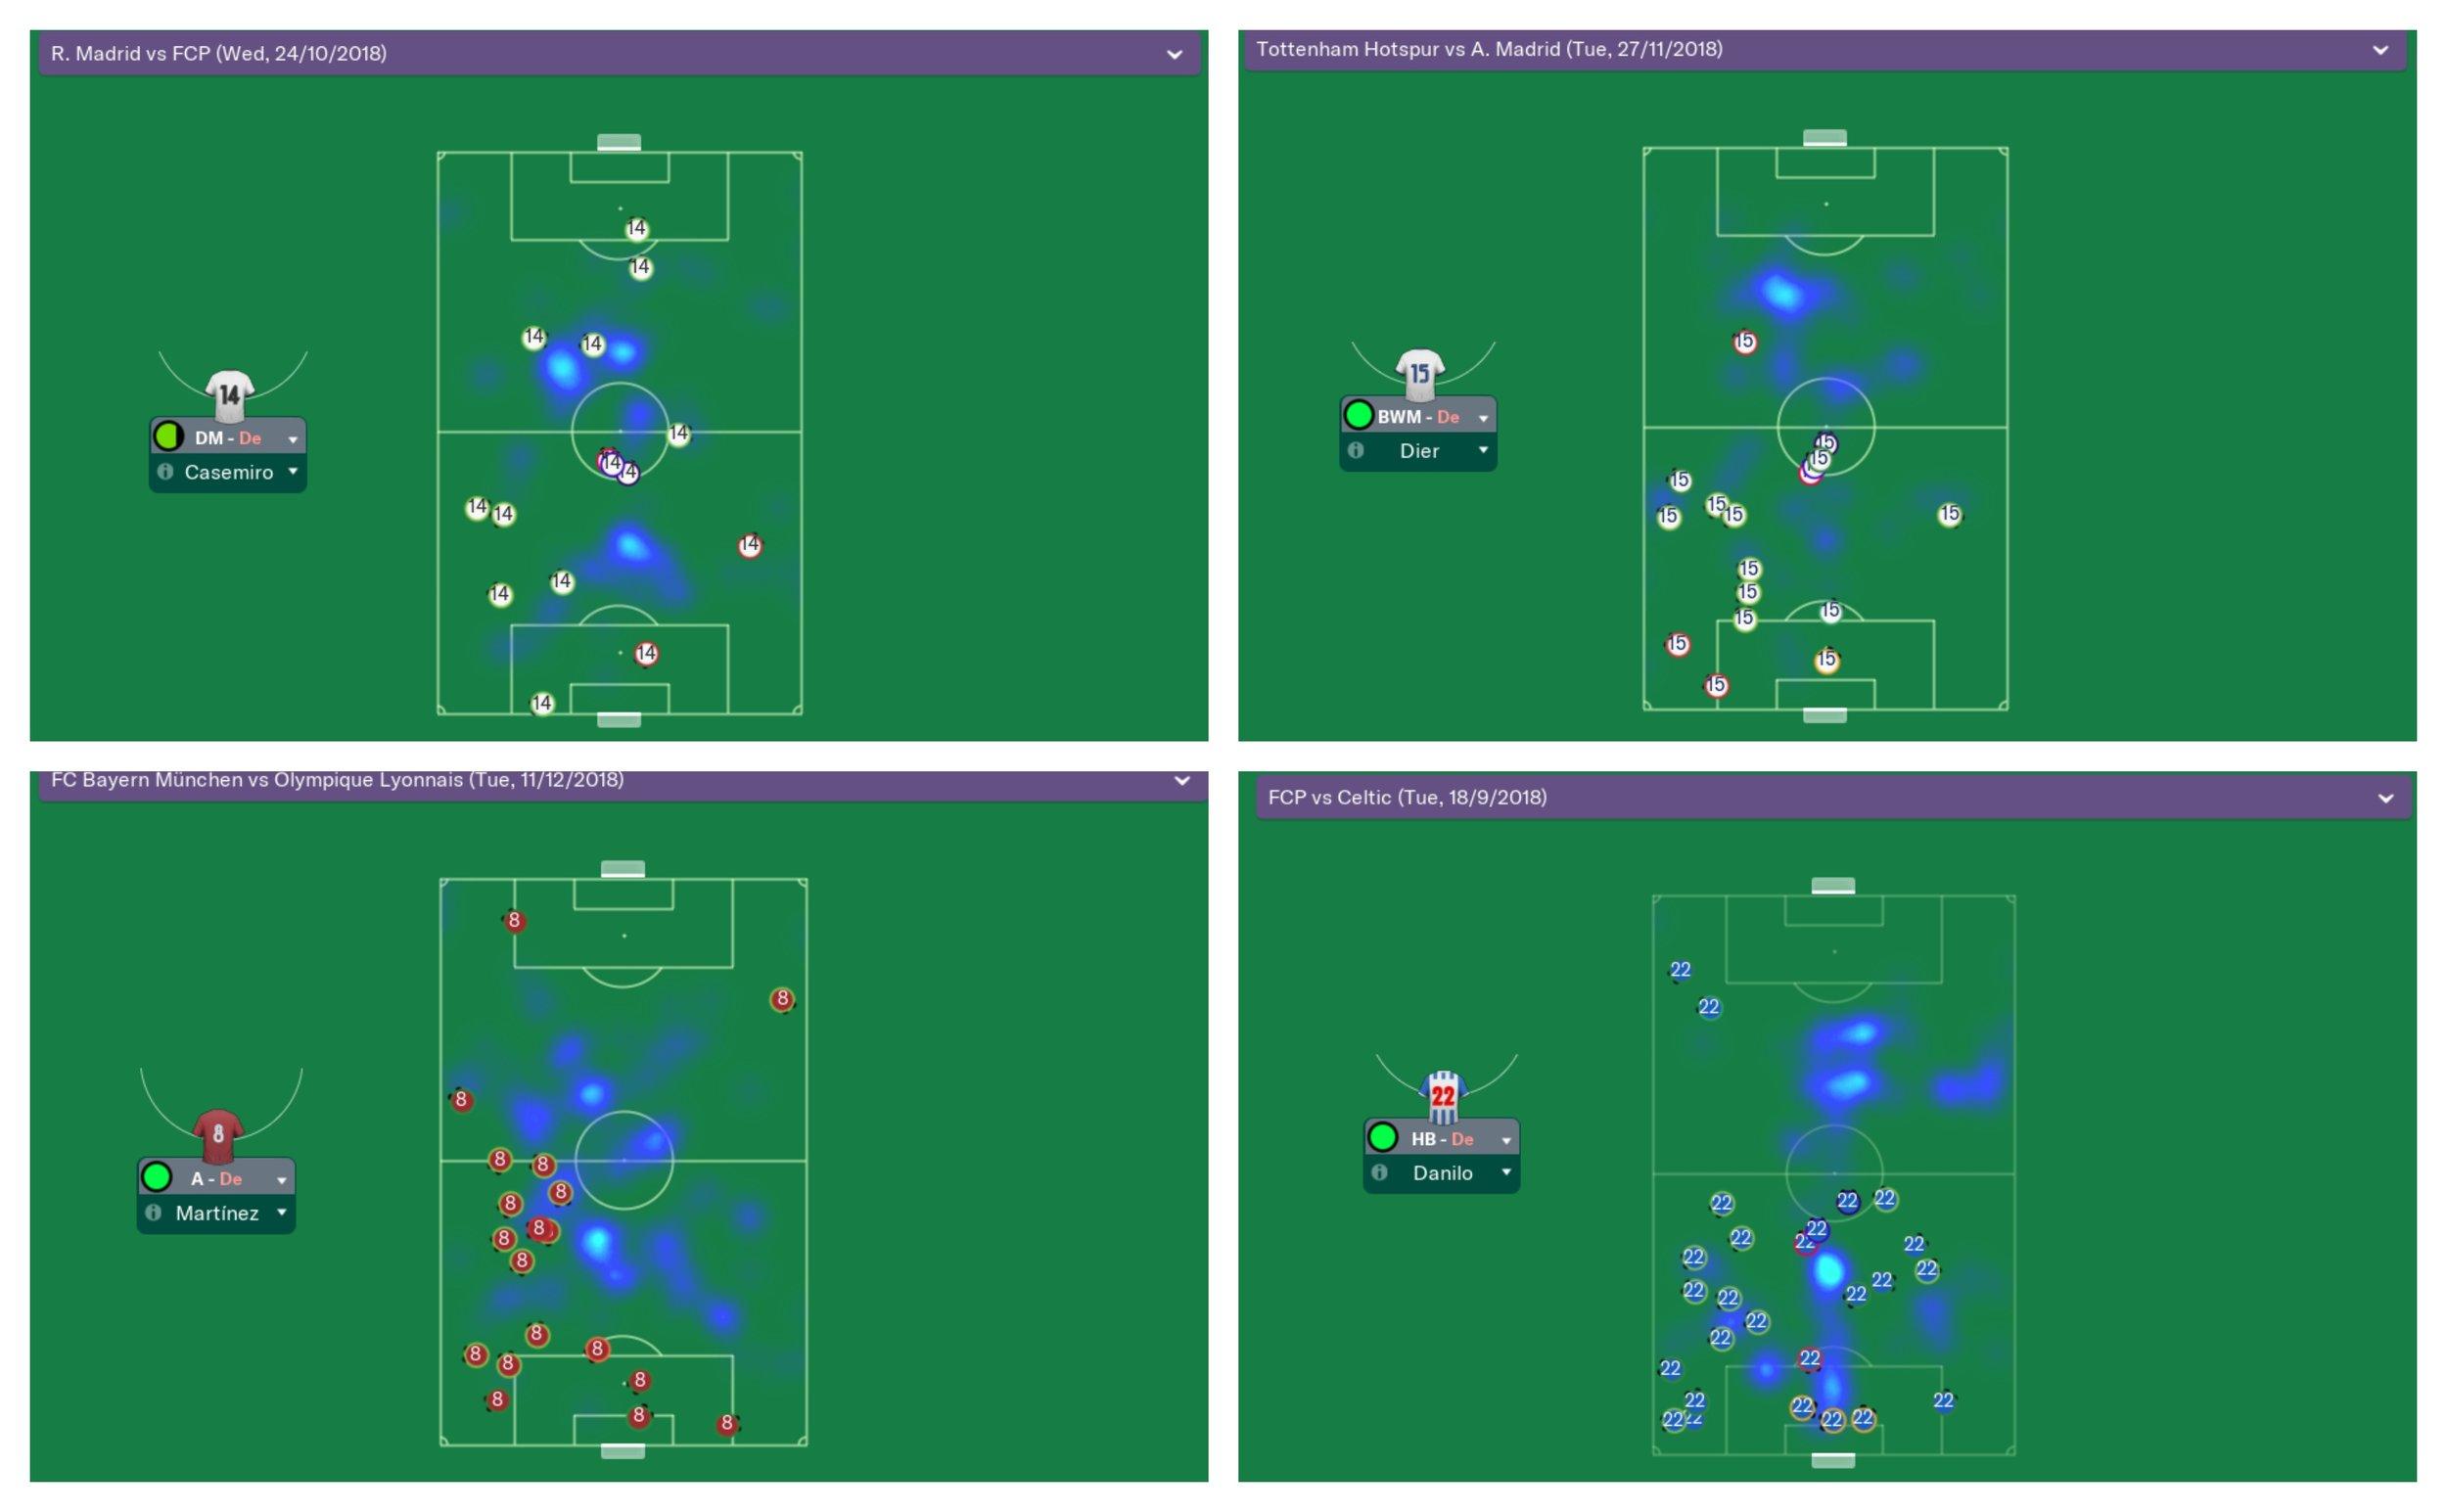 Heatmap illustrating movement, tackles, interceptions & key passes